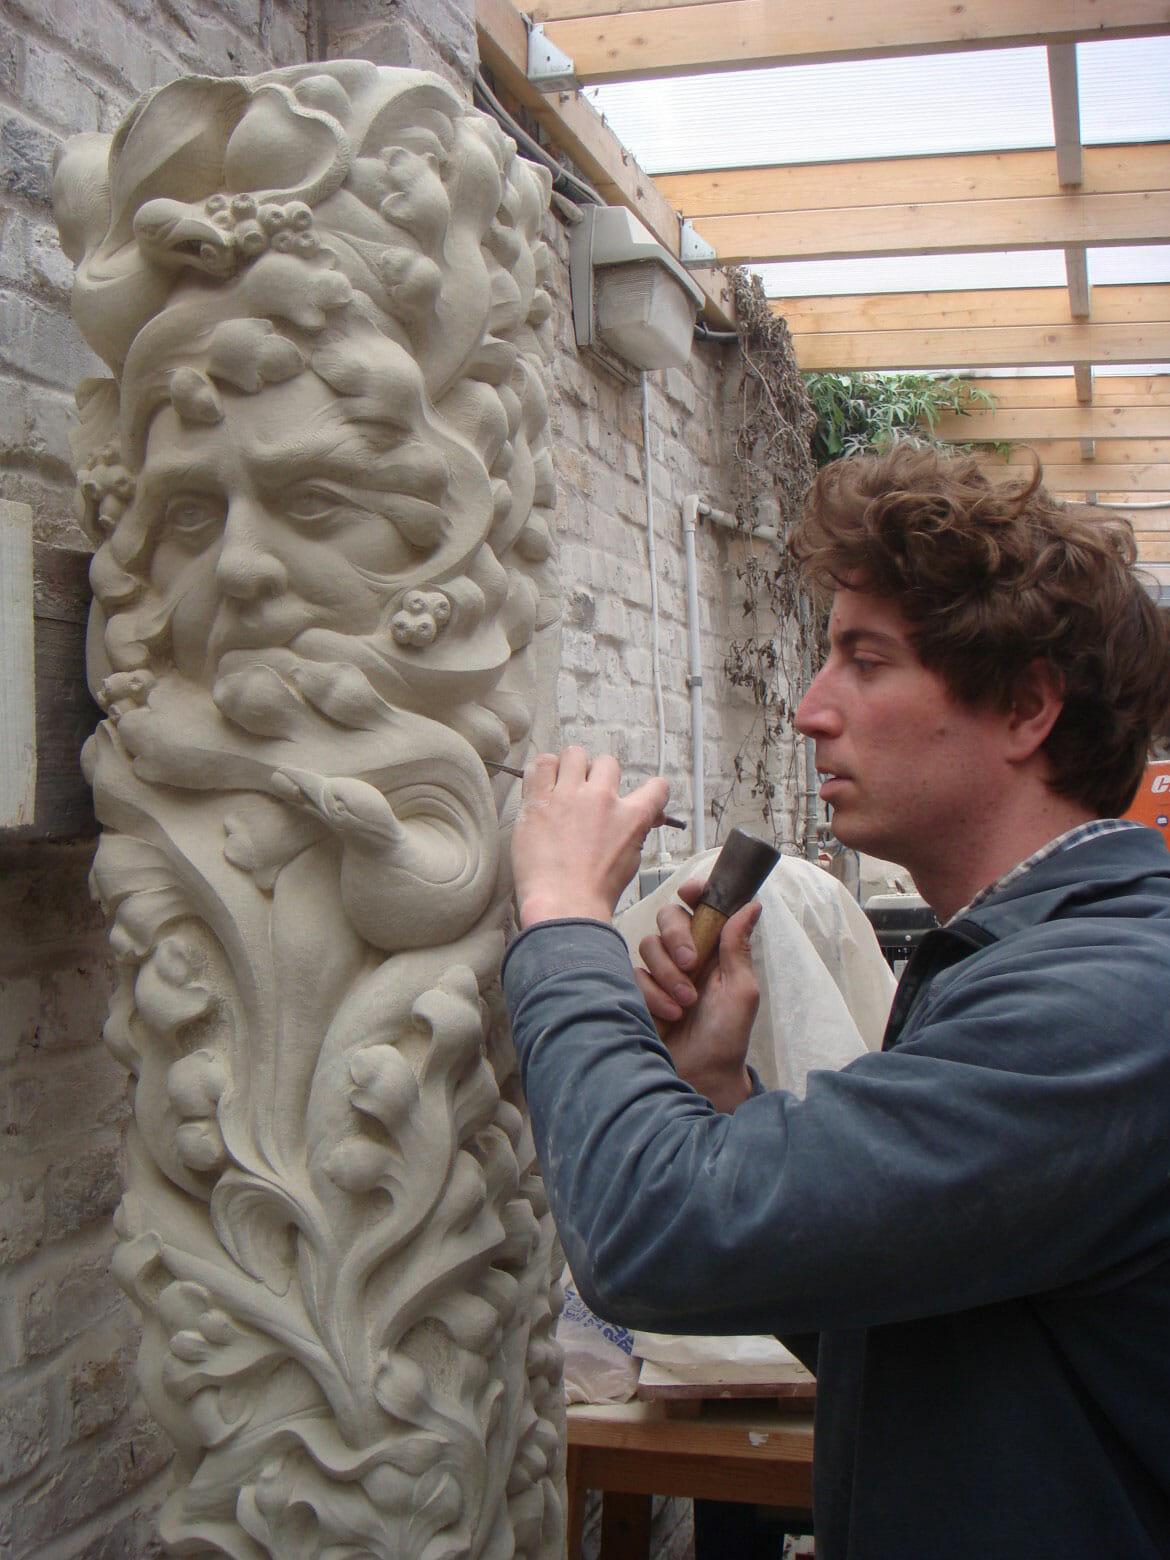 Greenman detail(Original Sandstone Garden Sculpture) Designed and Carved by Tom Nicholls, 2013